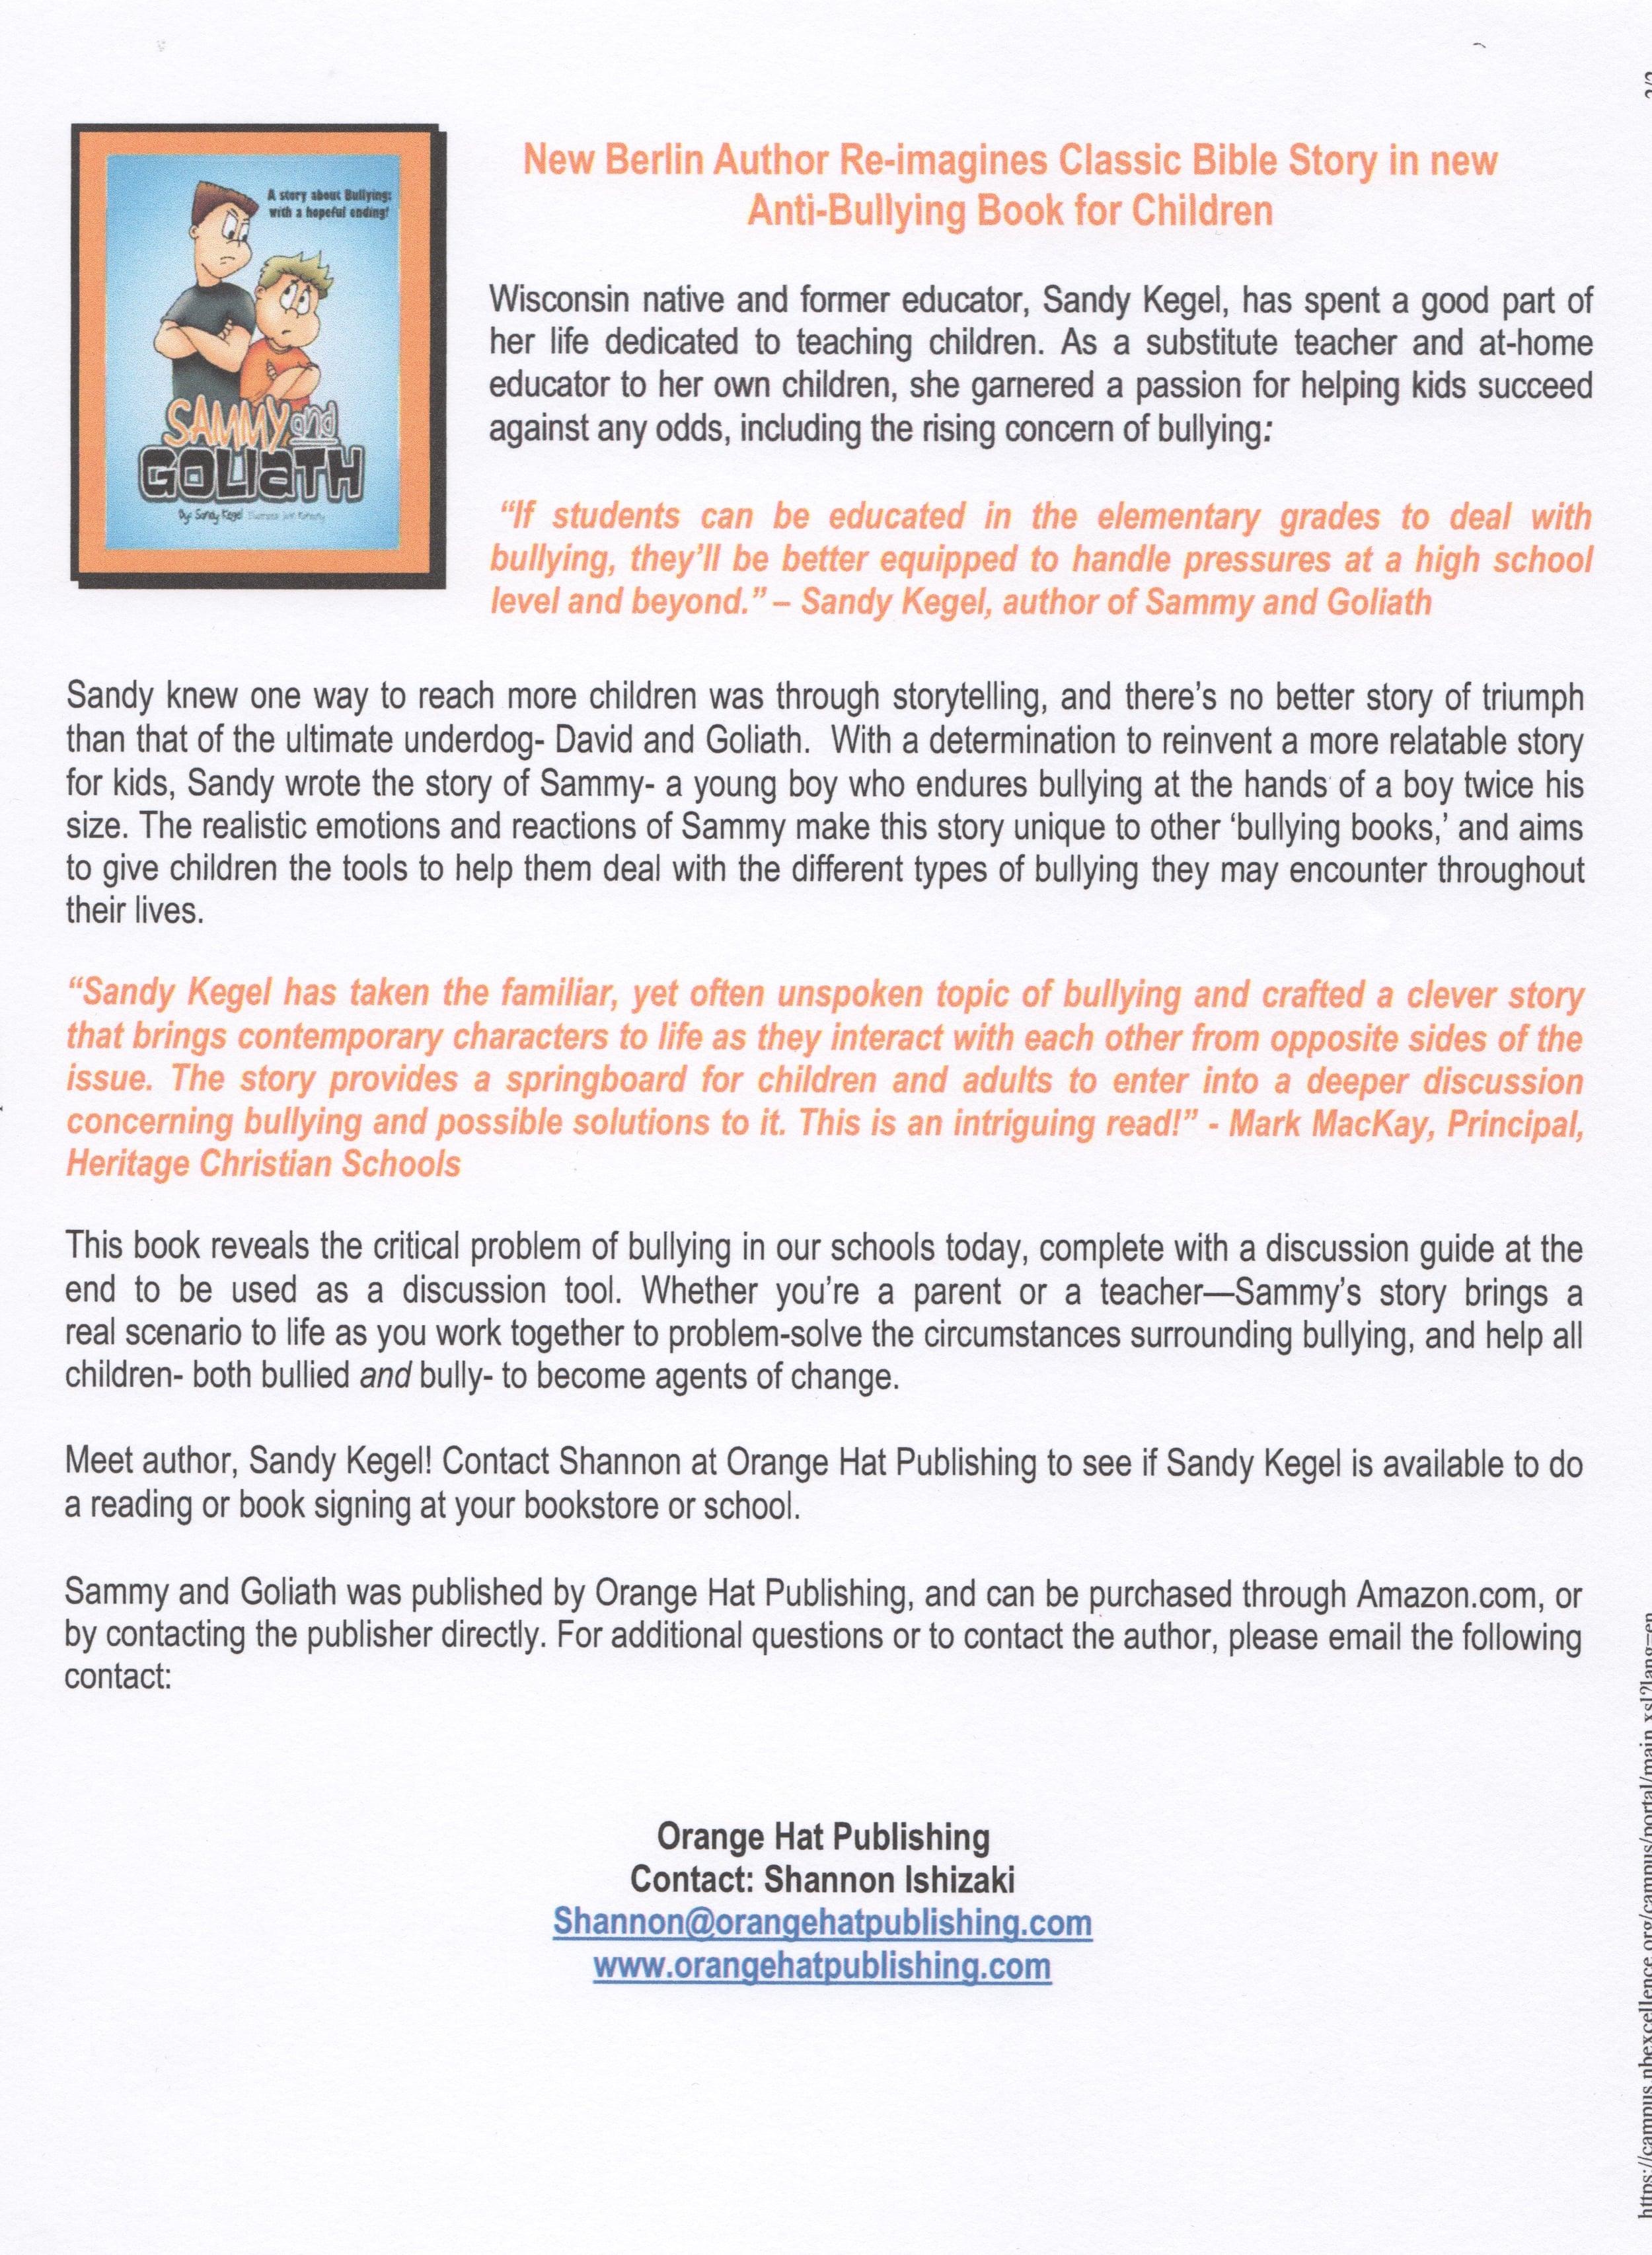 press release 1.jpeg